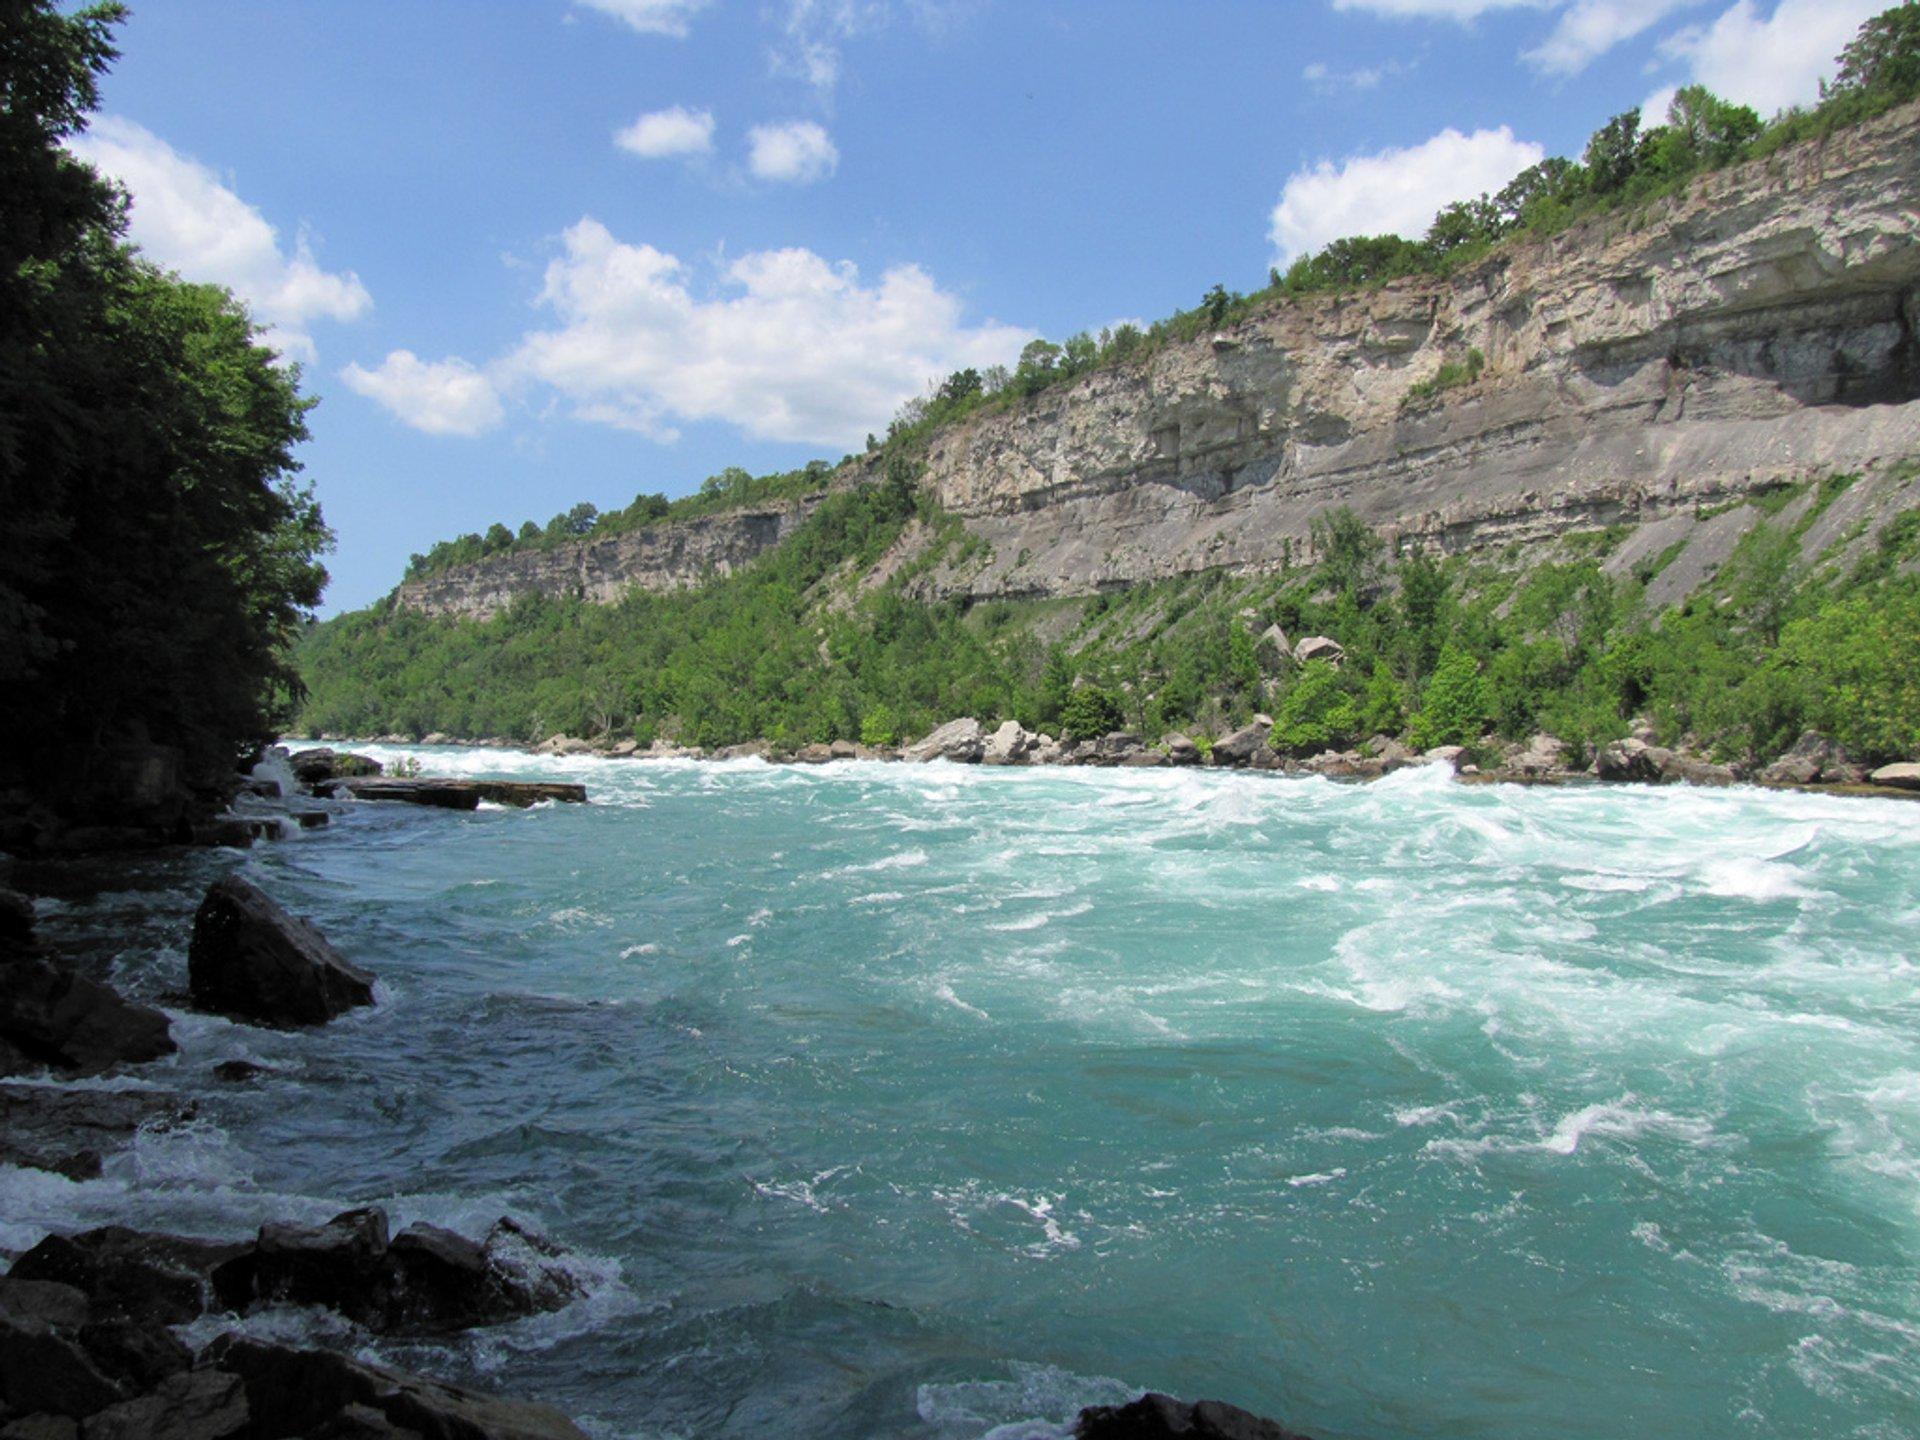 White Water Walk in Niagara Falls 2020 - Best Time